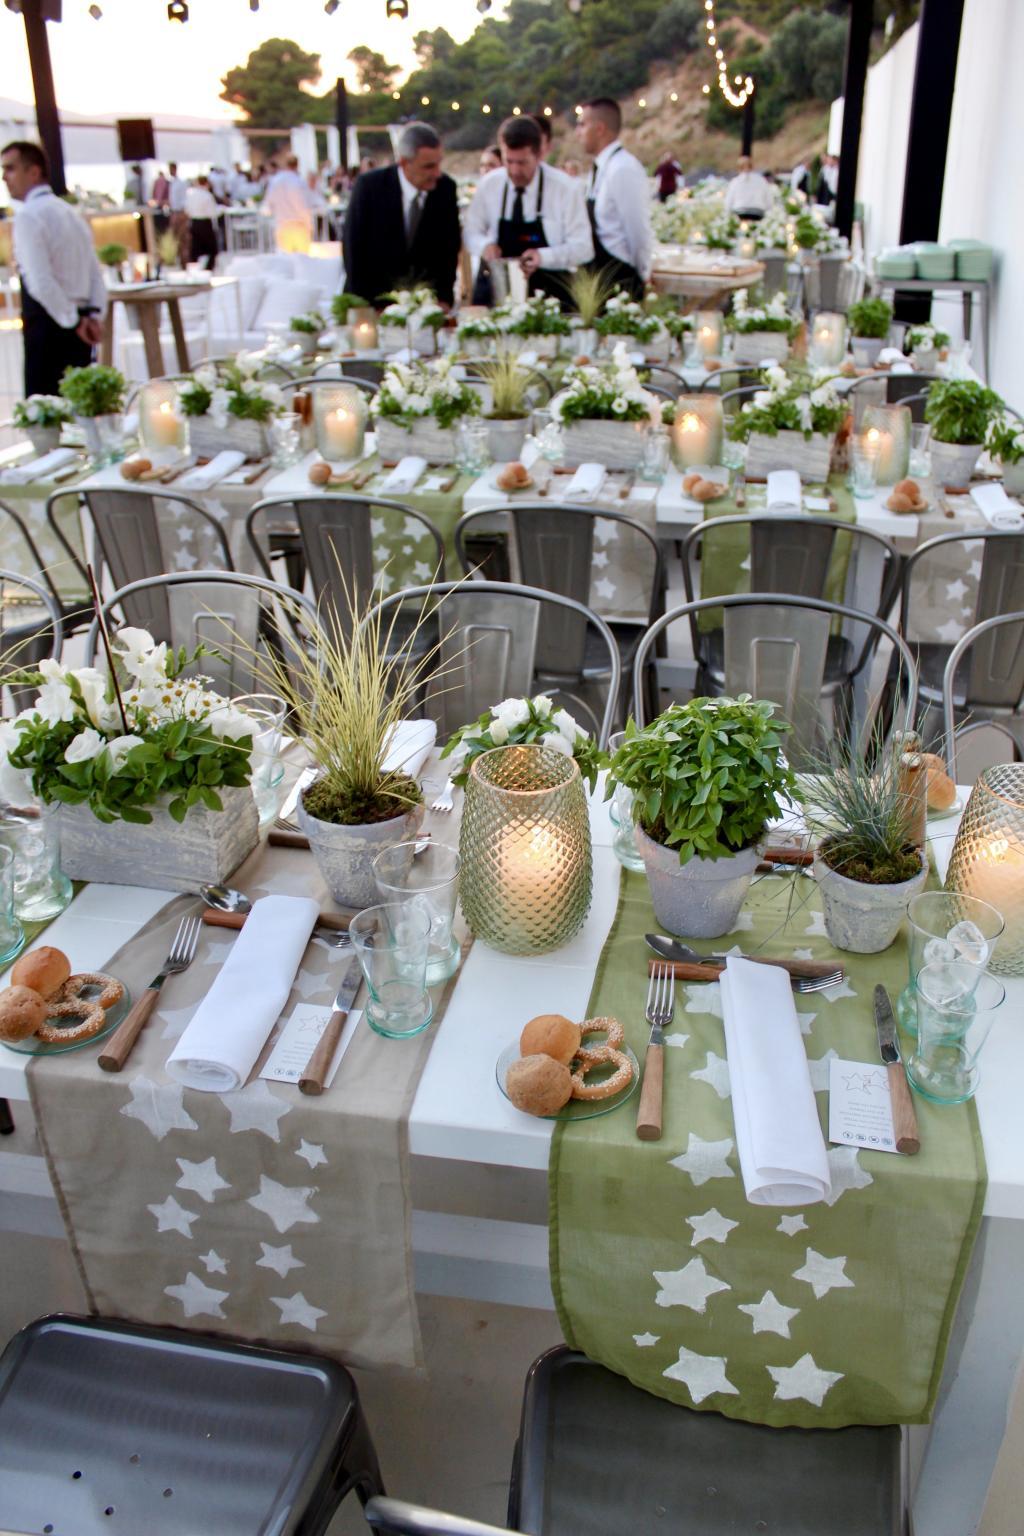 K&K Skiathos wedding - Image 19